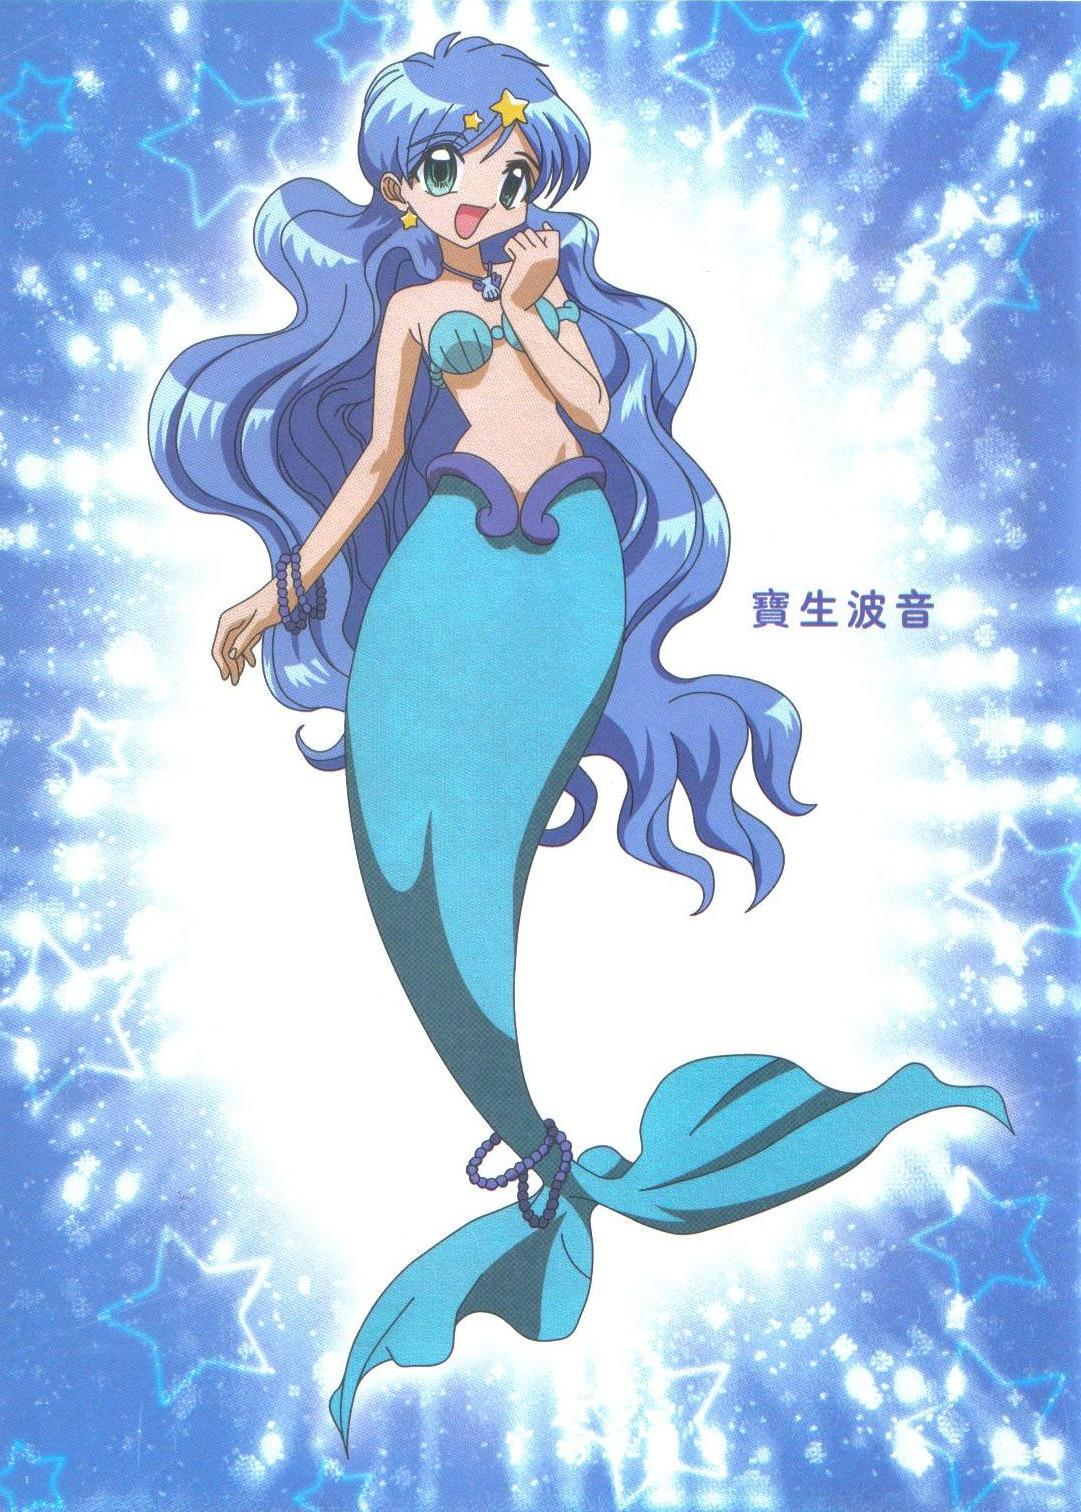 Uncategorized Hanon Mermaid Melody houshou hanon mermaid melody pichi pitch image 31589 tags anime official art